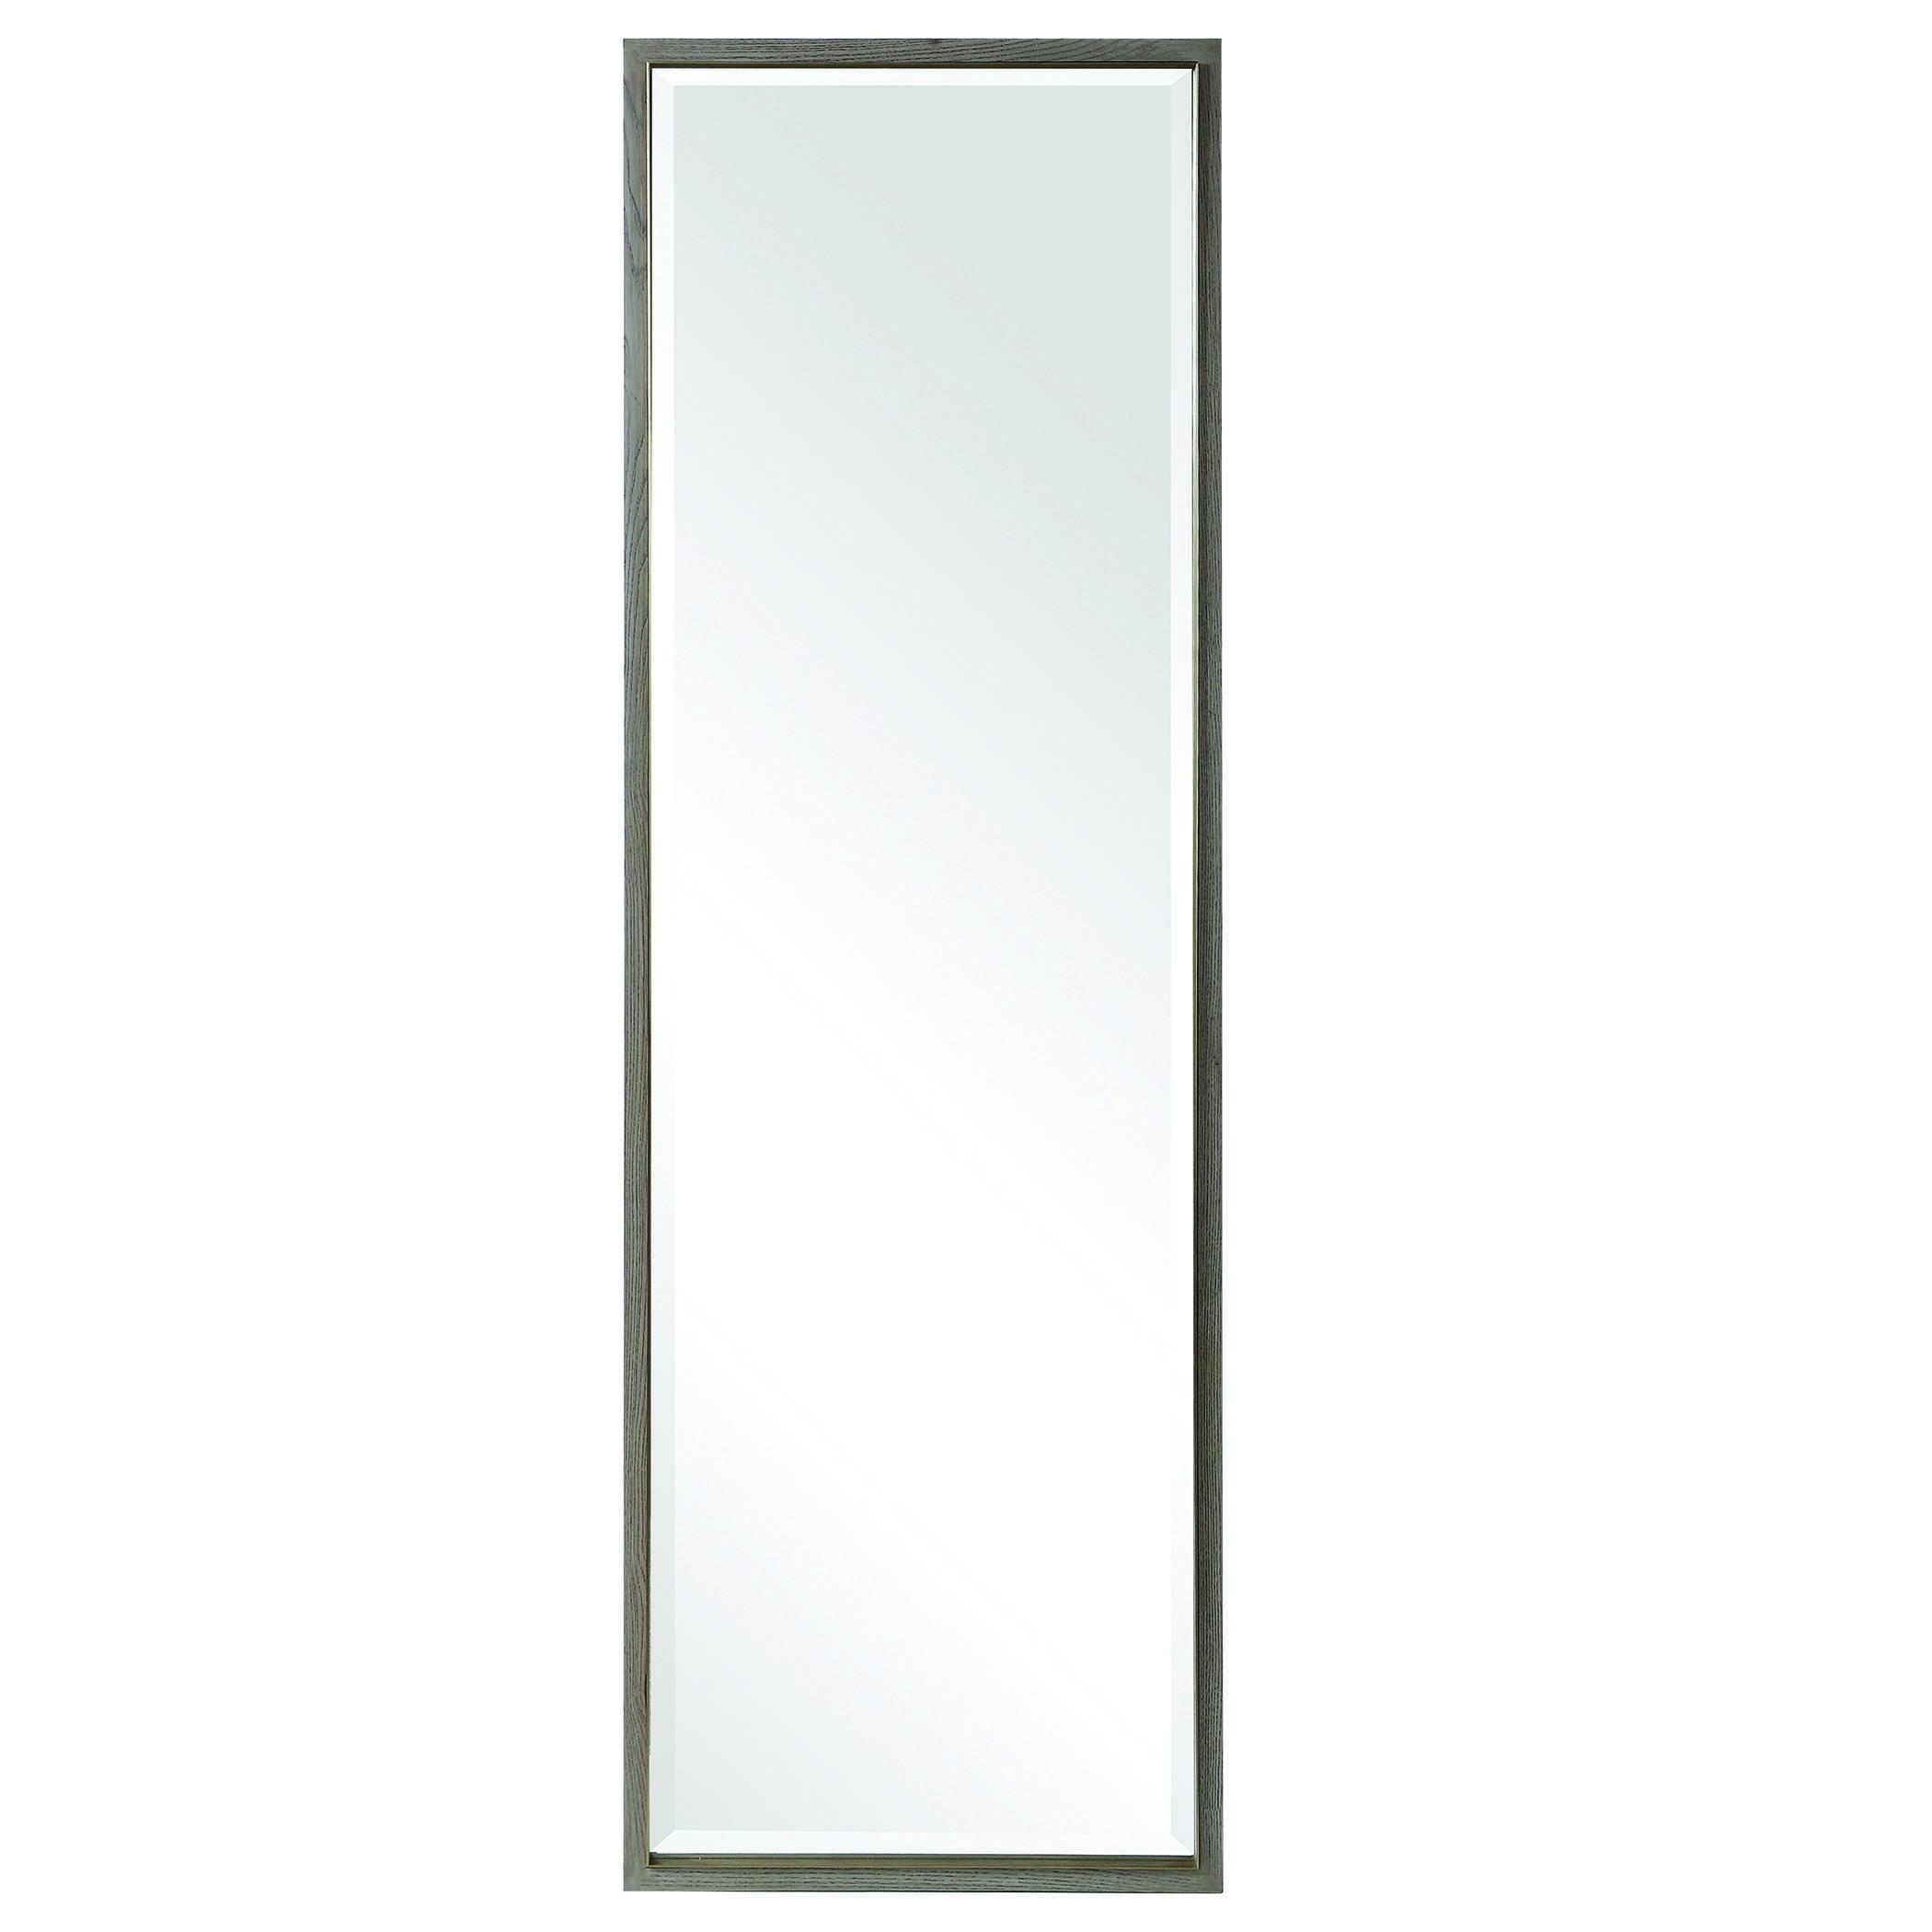 Uttermost Kian Wooden Dressing Mirror